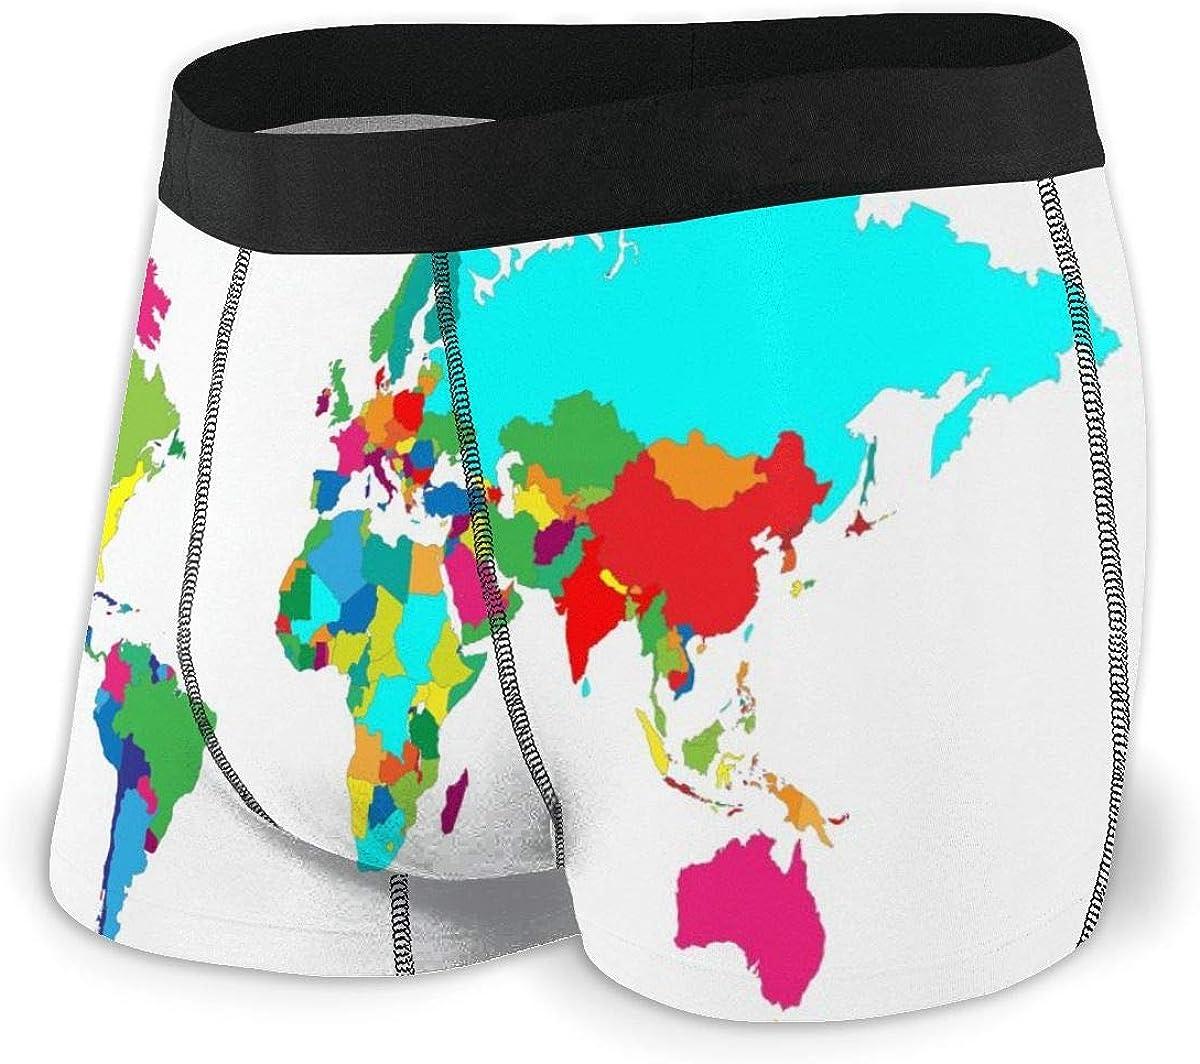 Mens Boxer Briefs Vintage Retro World Map Boys Trunks Underwear Short Leg Breathable Man